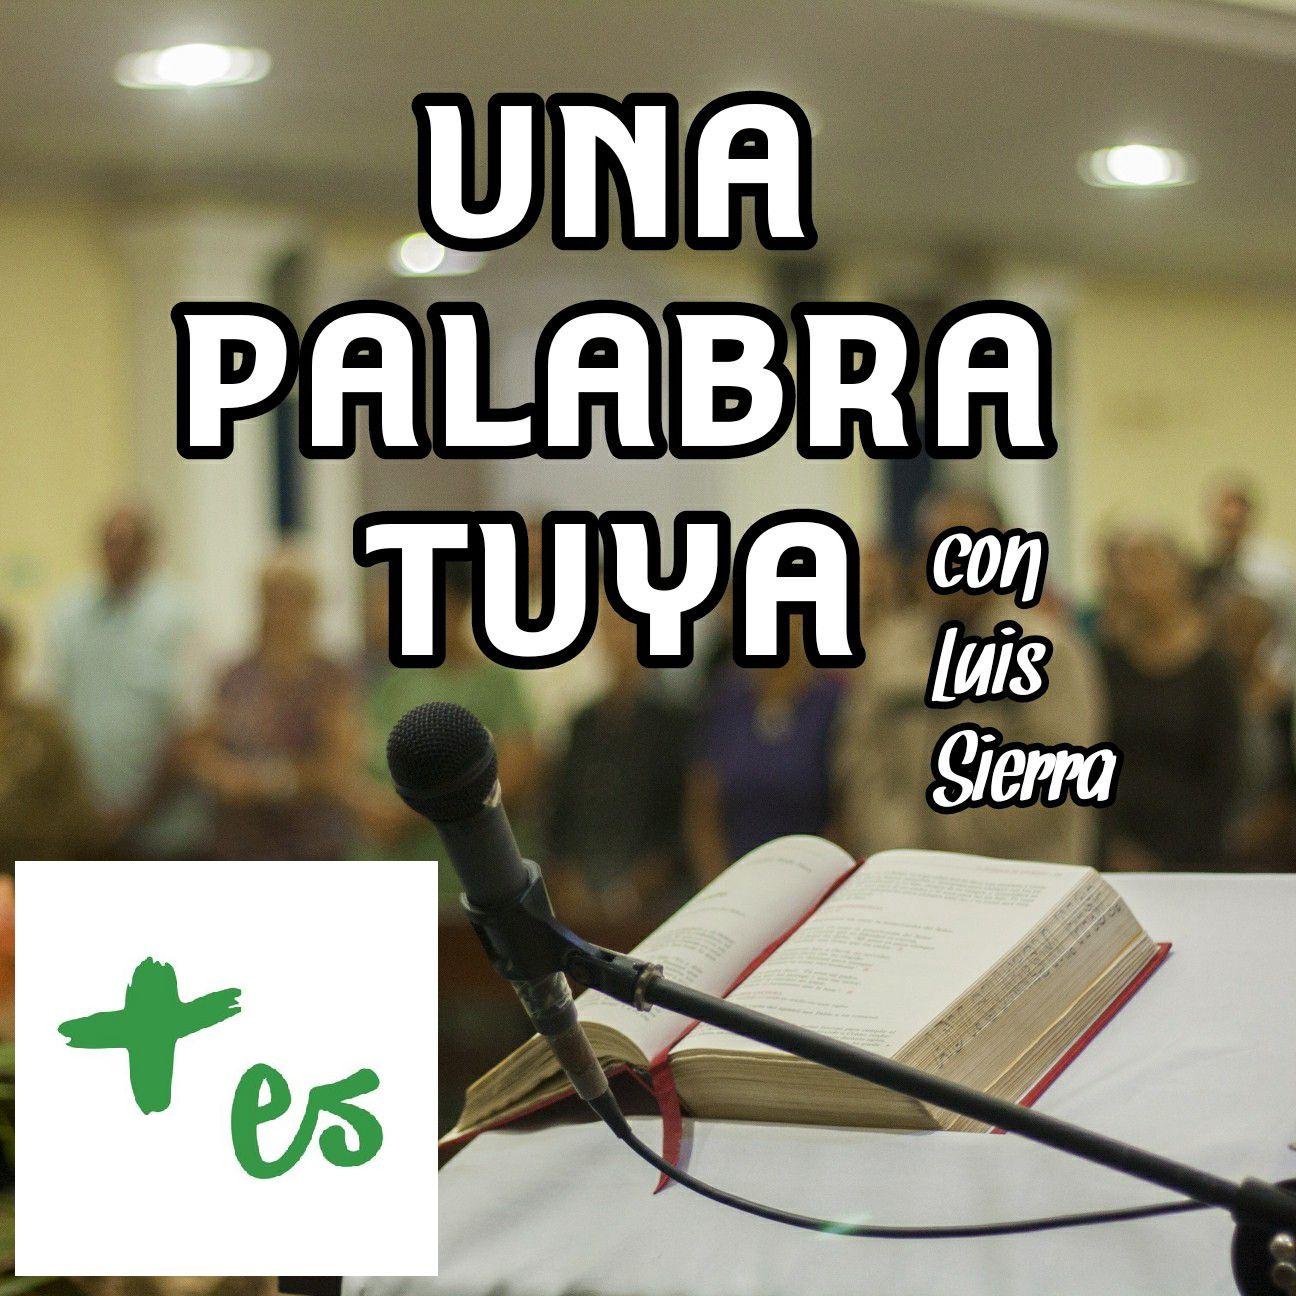 Despedimos Una Palabra Tuya | Pentecostés